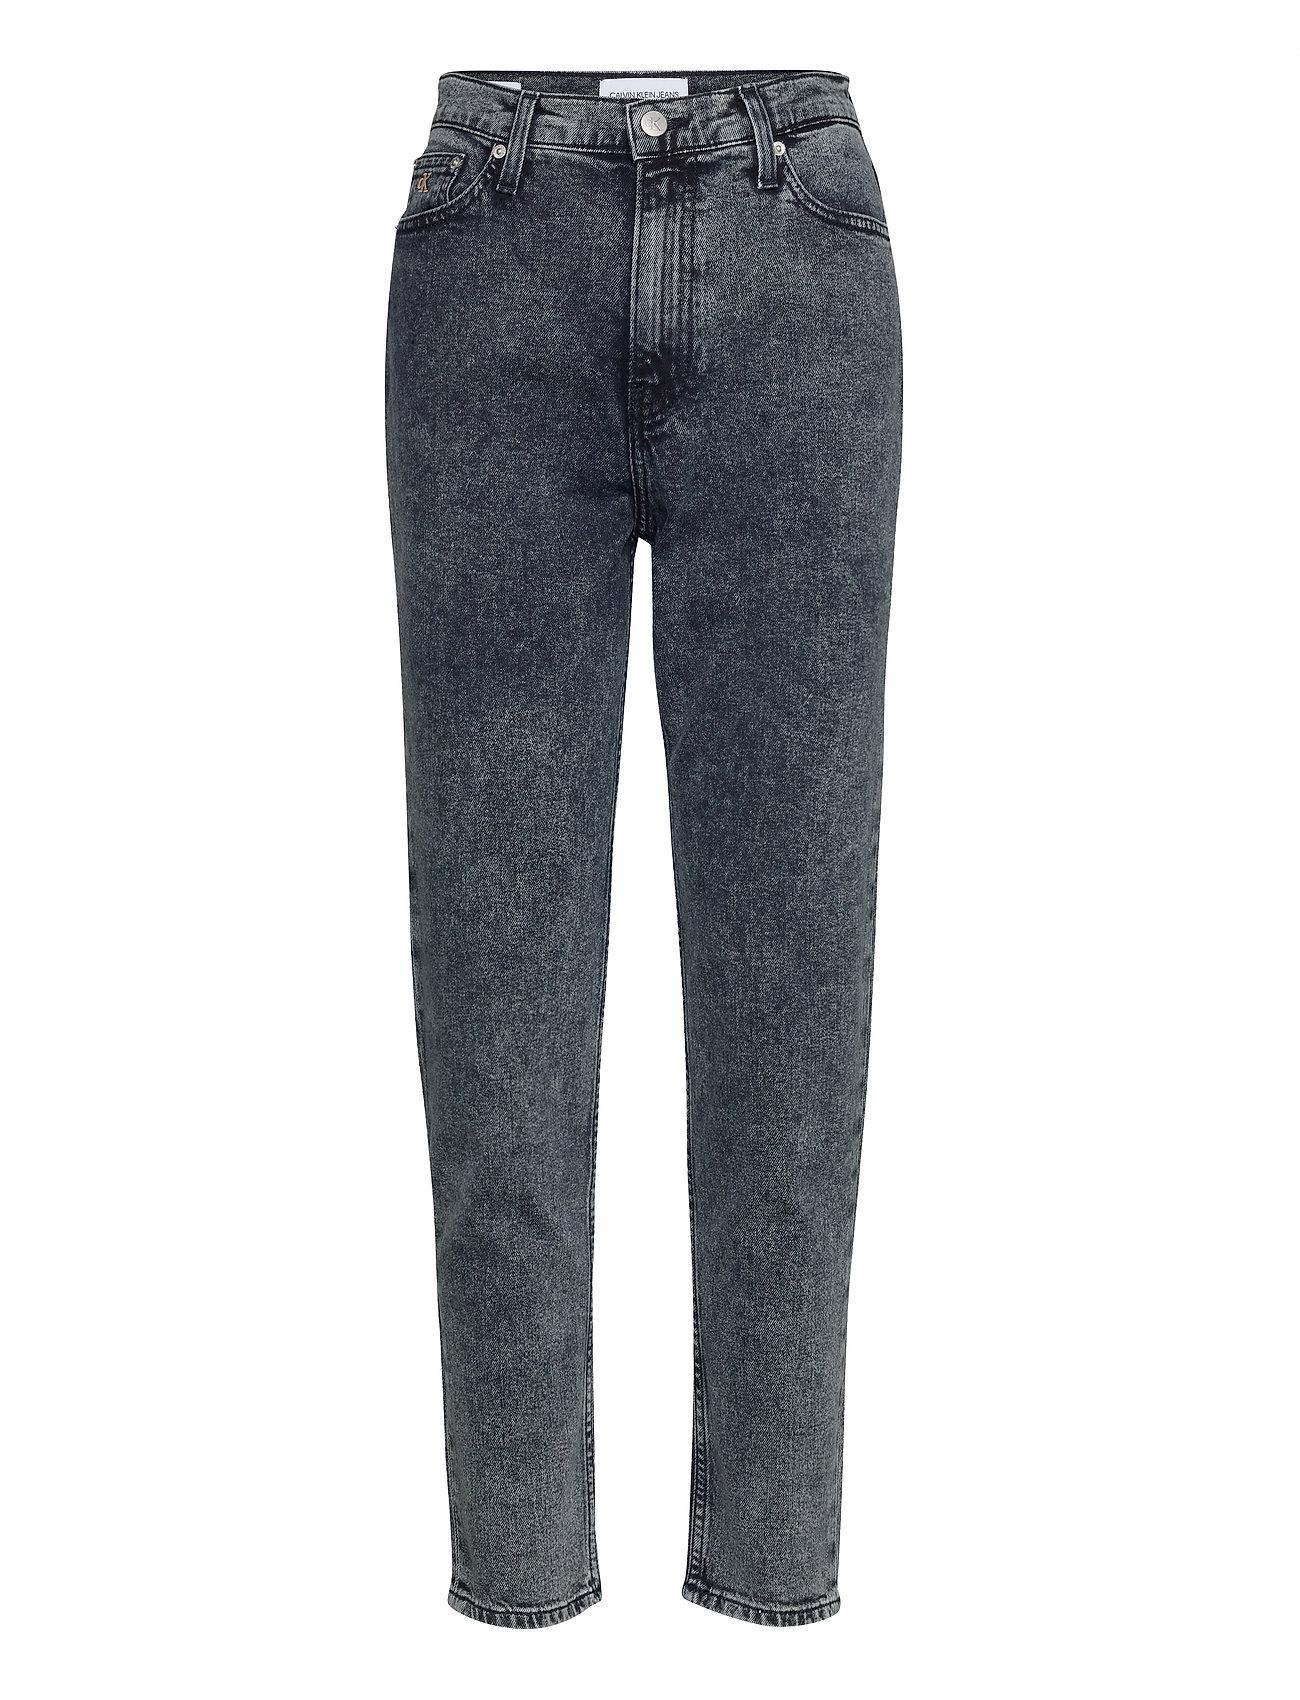 Image of Mom Jean Jeans Mom Jeans Blå Calvin Klein Jeans (3490090225)